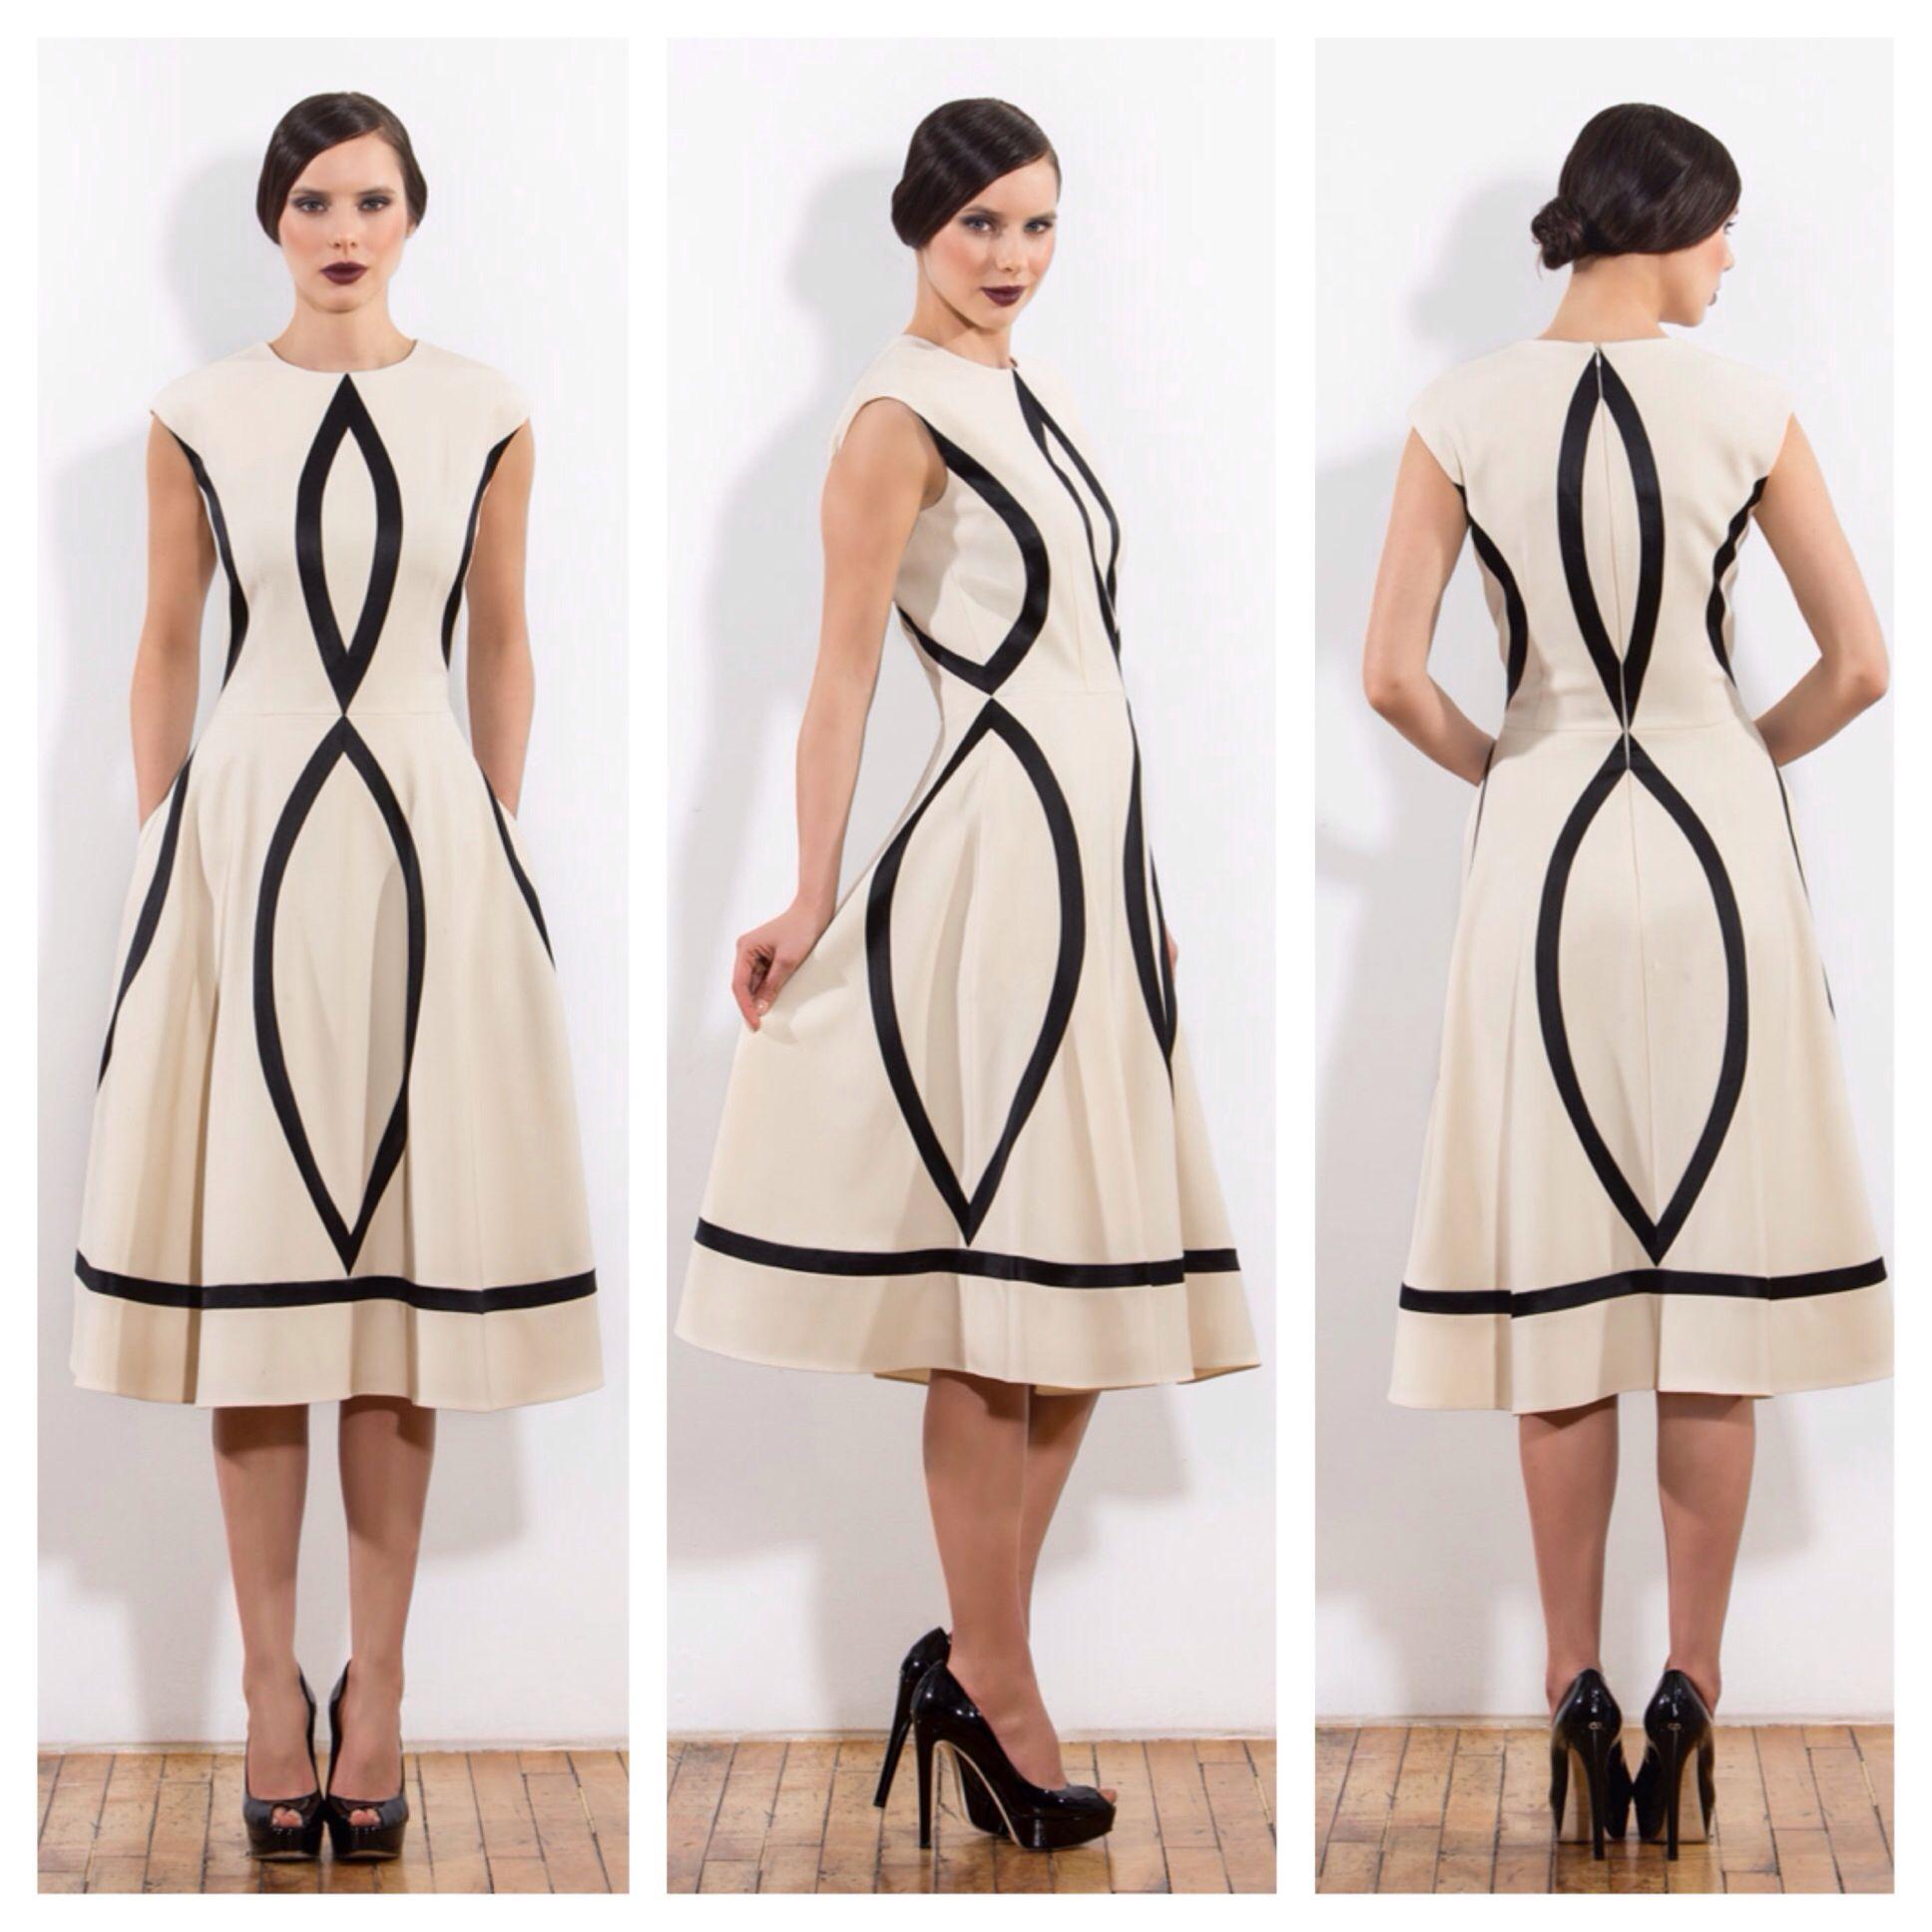 Christiana J. Paul Fall 2014 Asher Dress